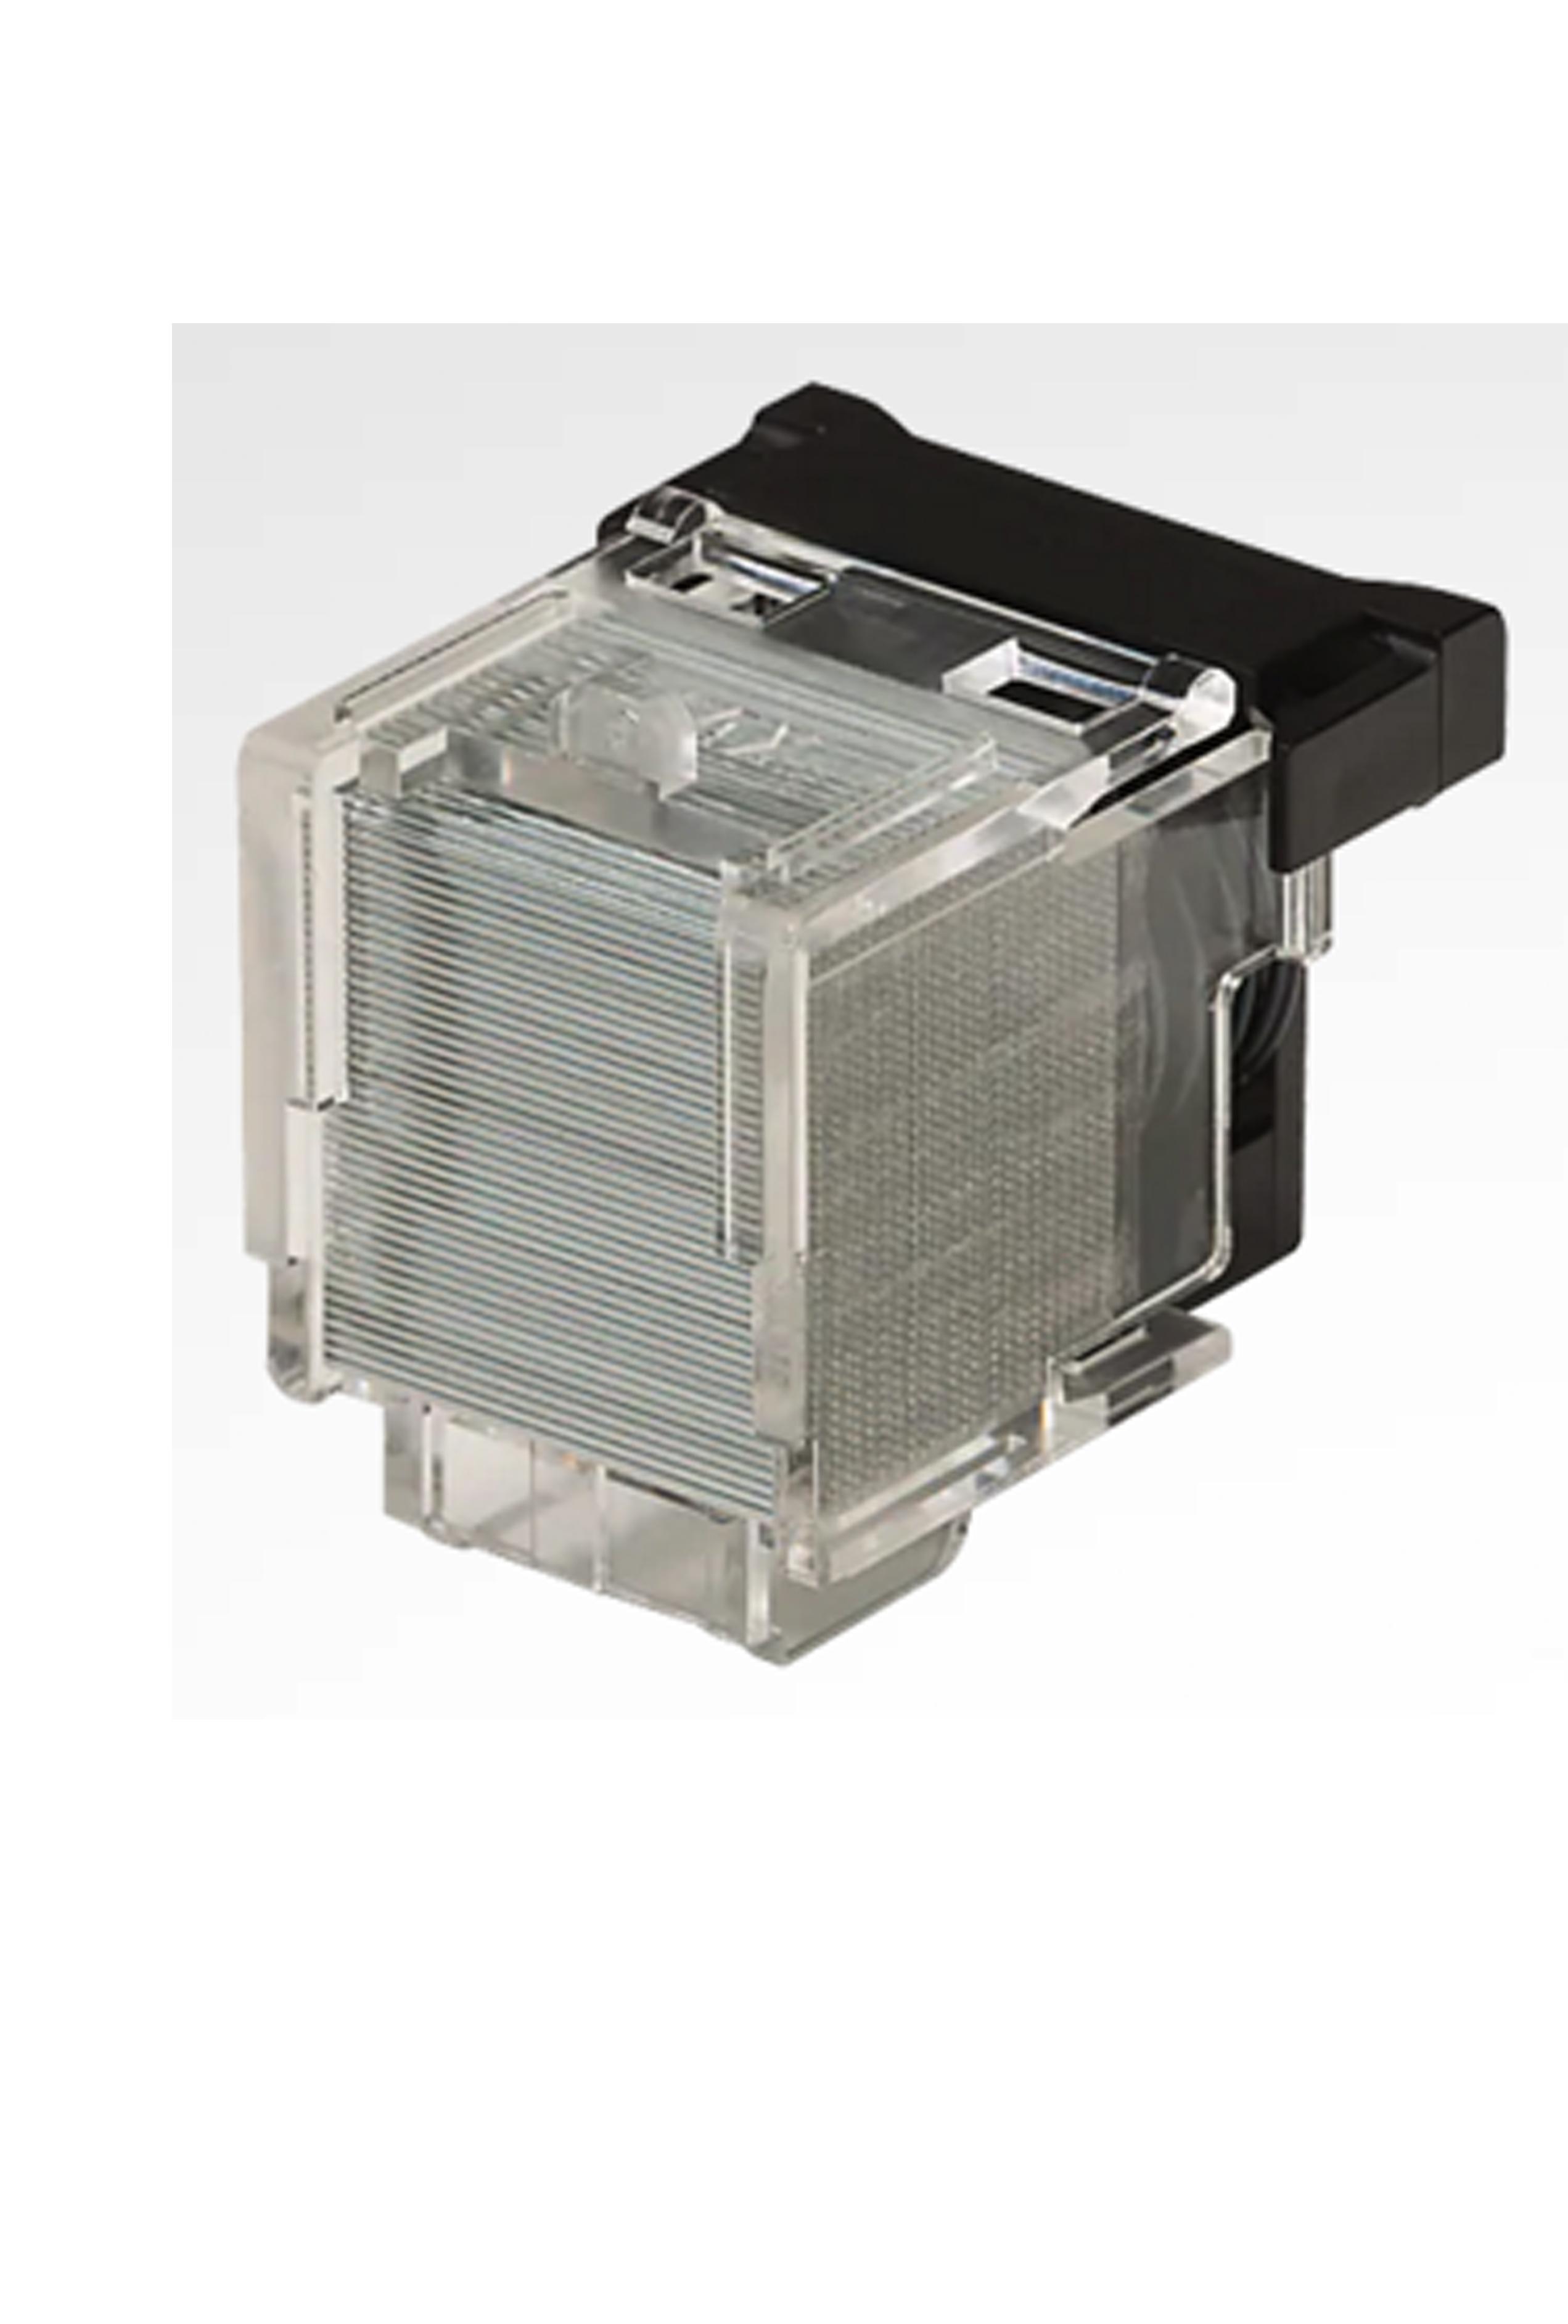 HP 2-pack 2000-staple Cartridge (CC383A)